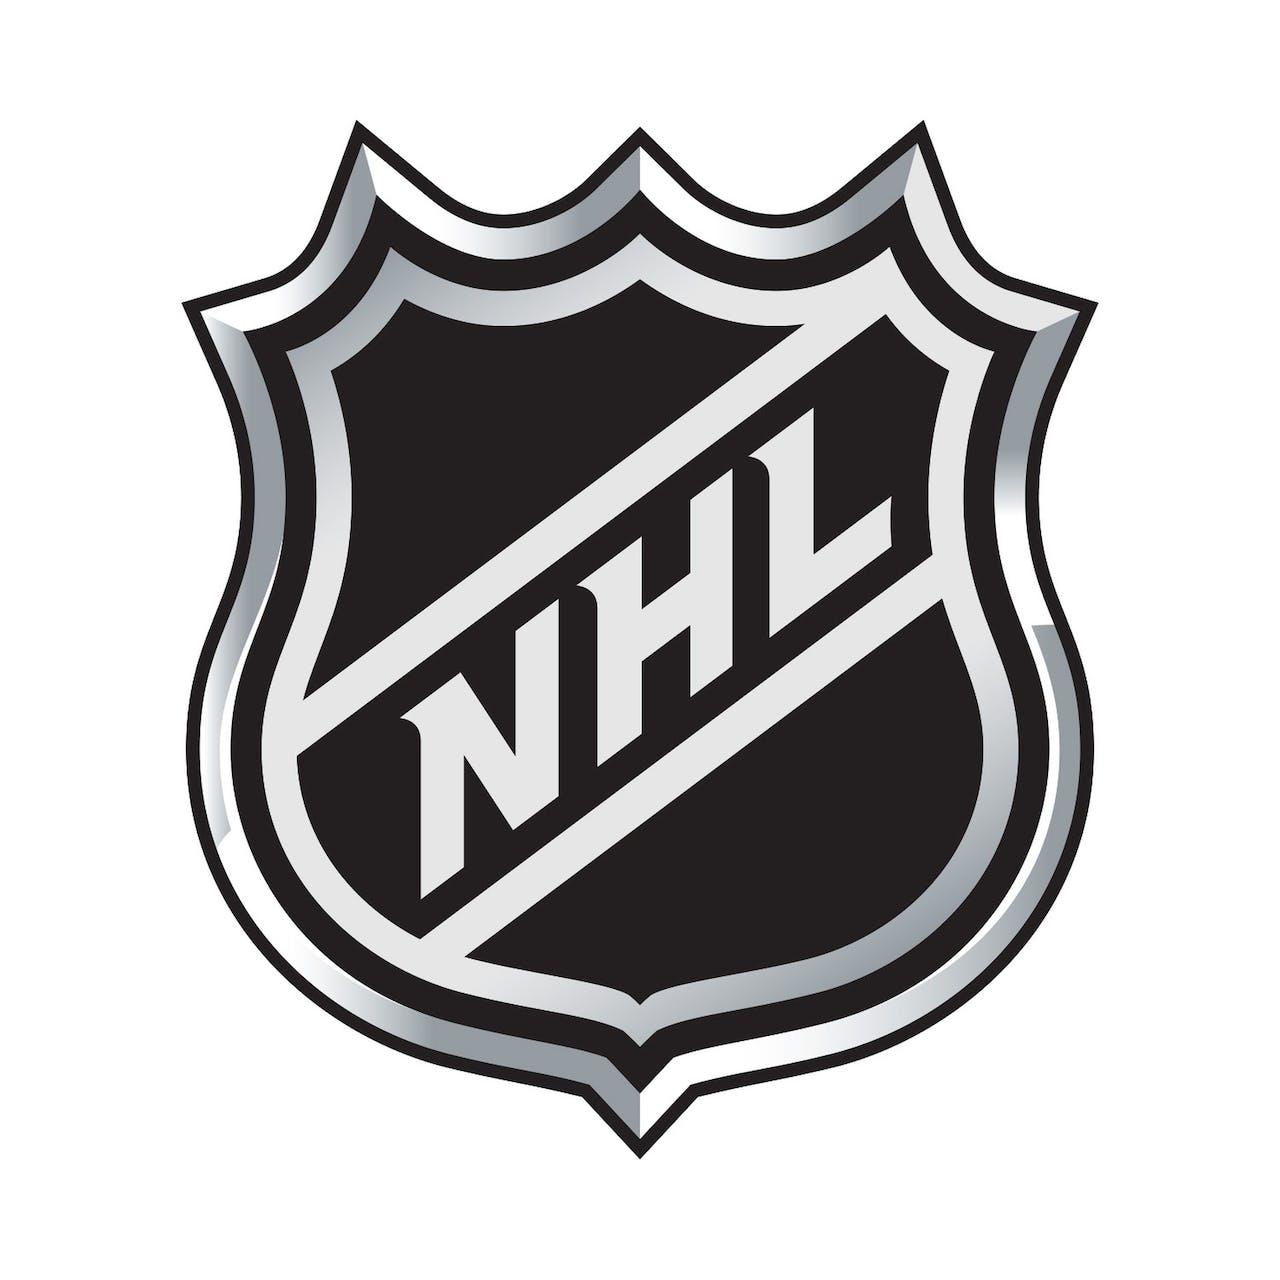 (C) NHL/PULS 24